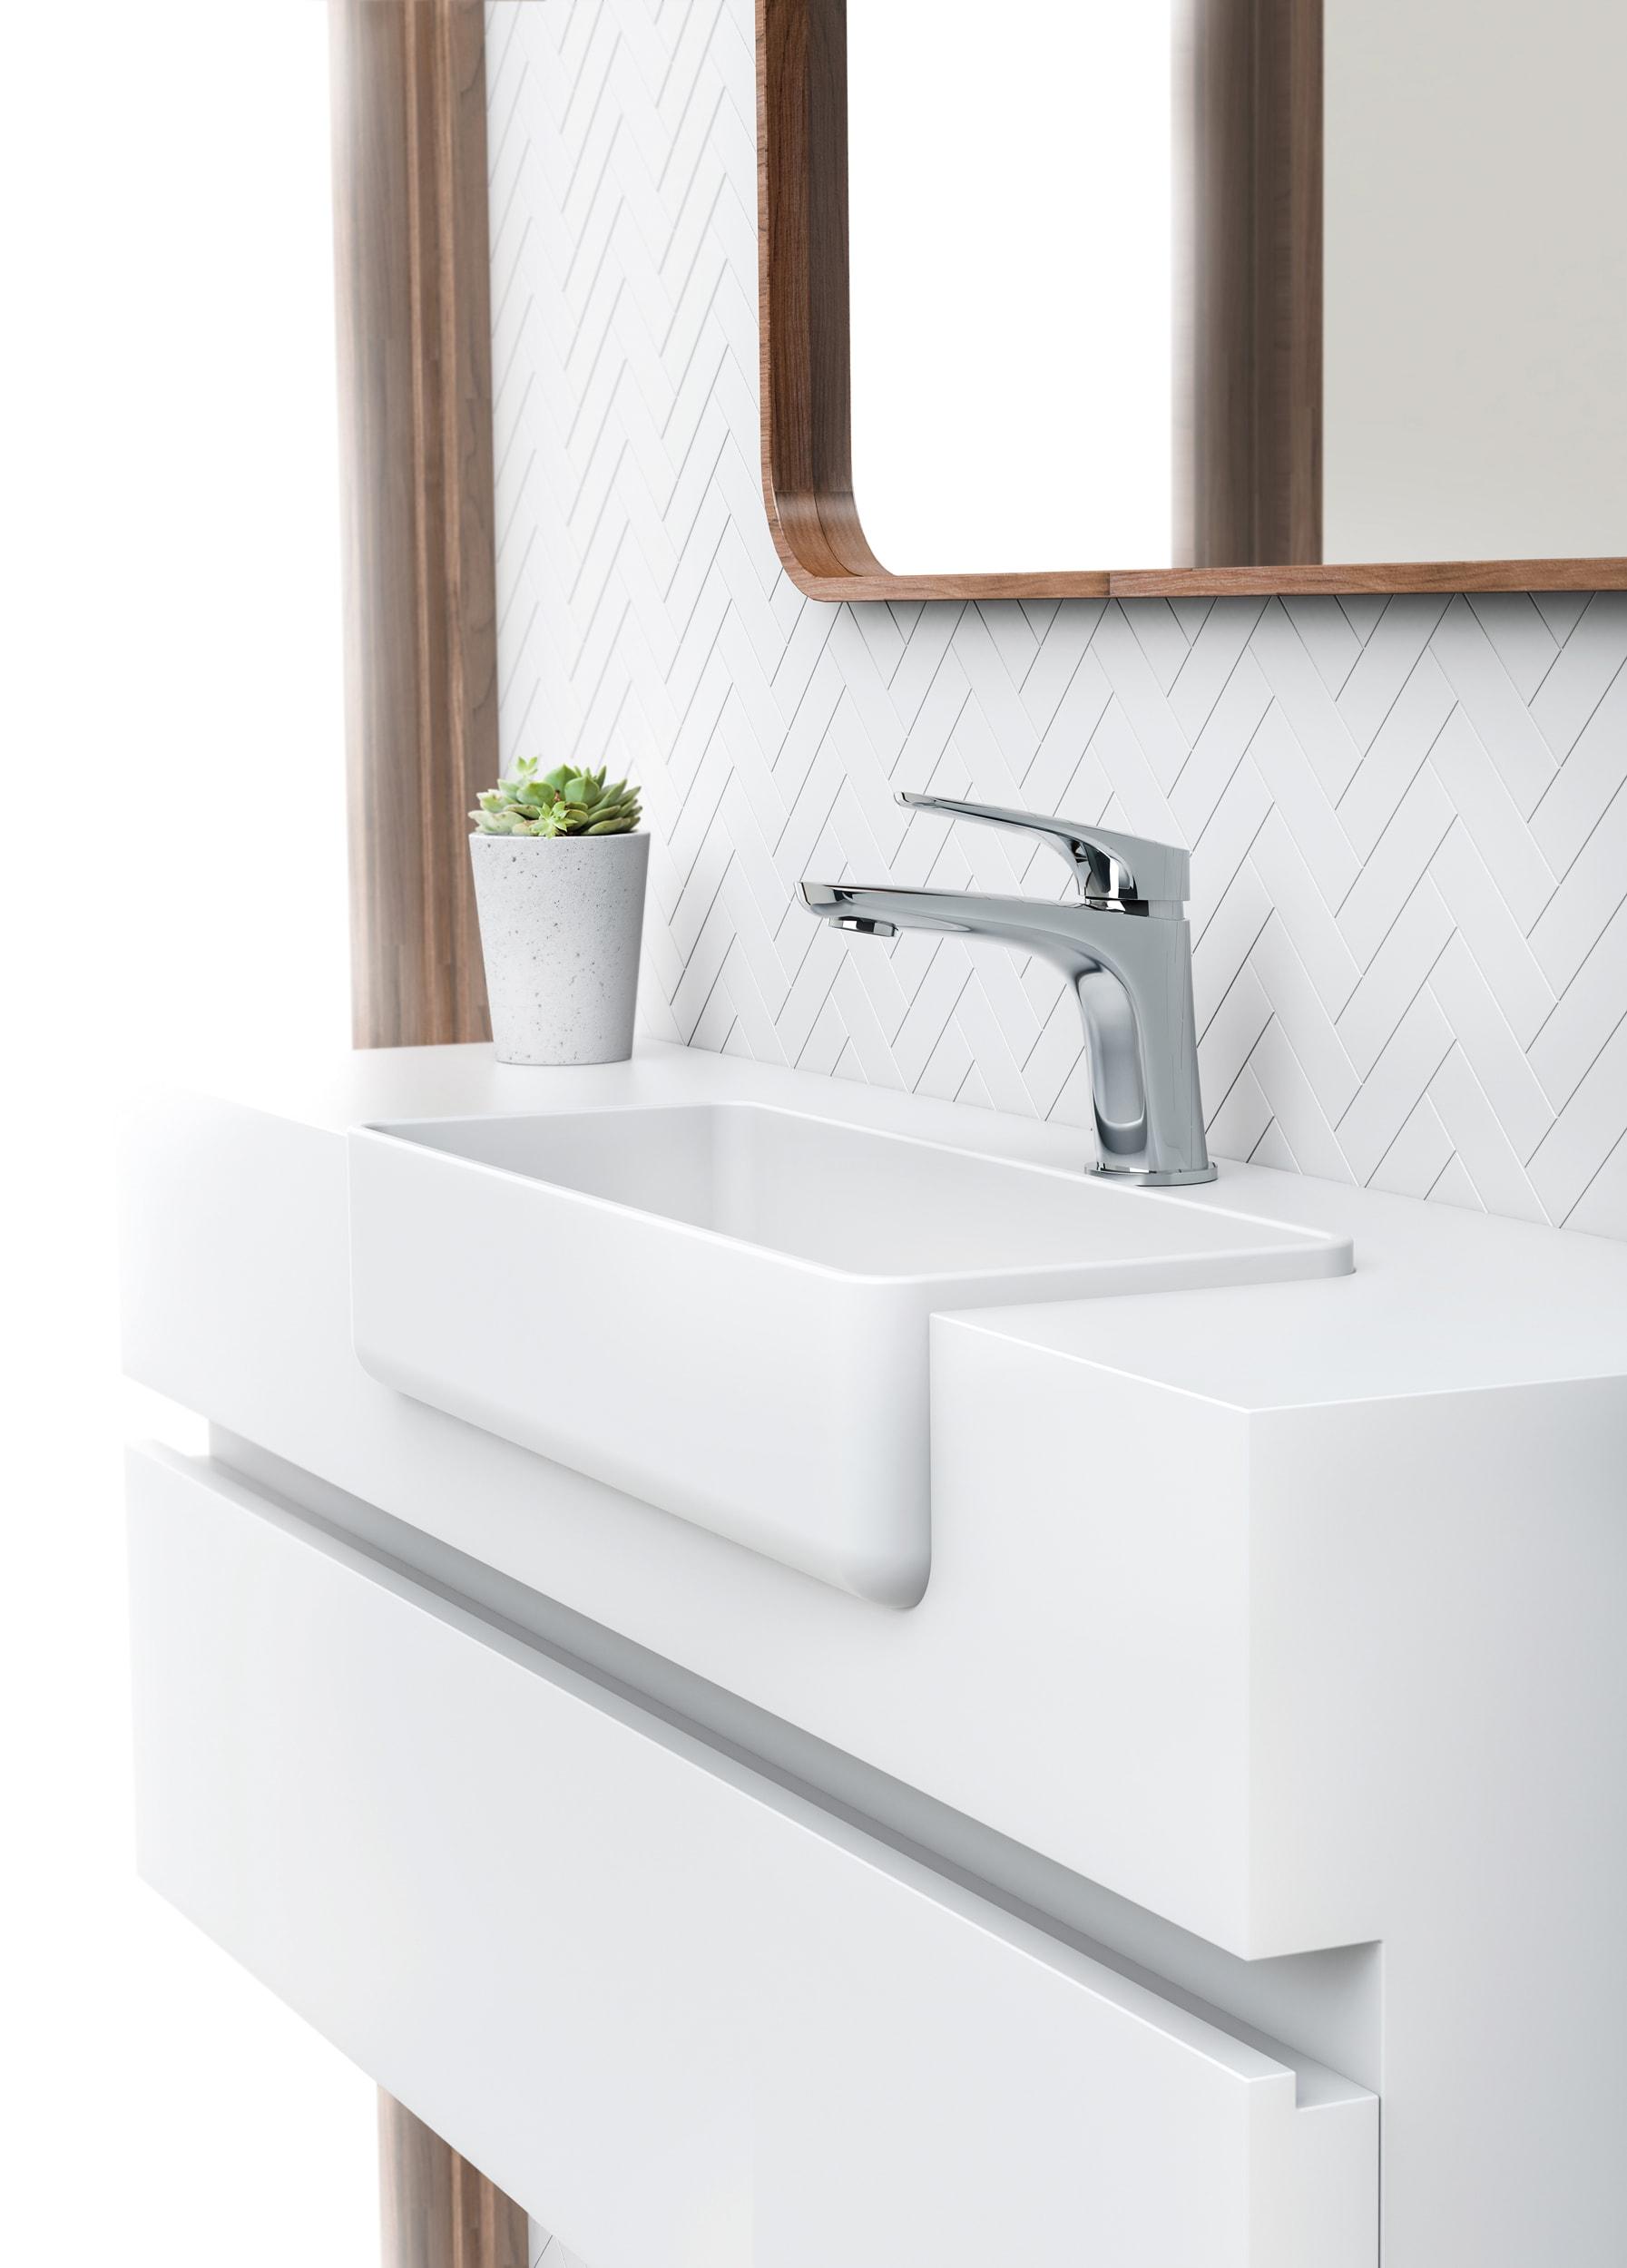 Highgrove Bathrooms - Bathroom Accessories & Equipment - 200 Princes ...